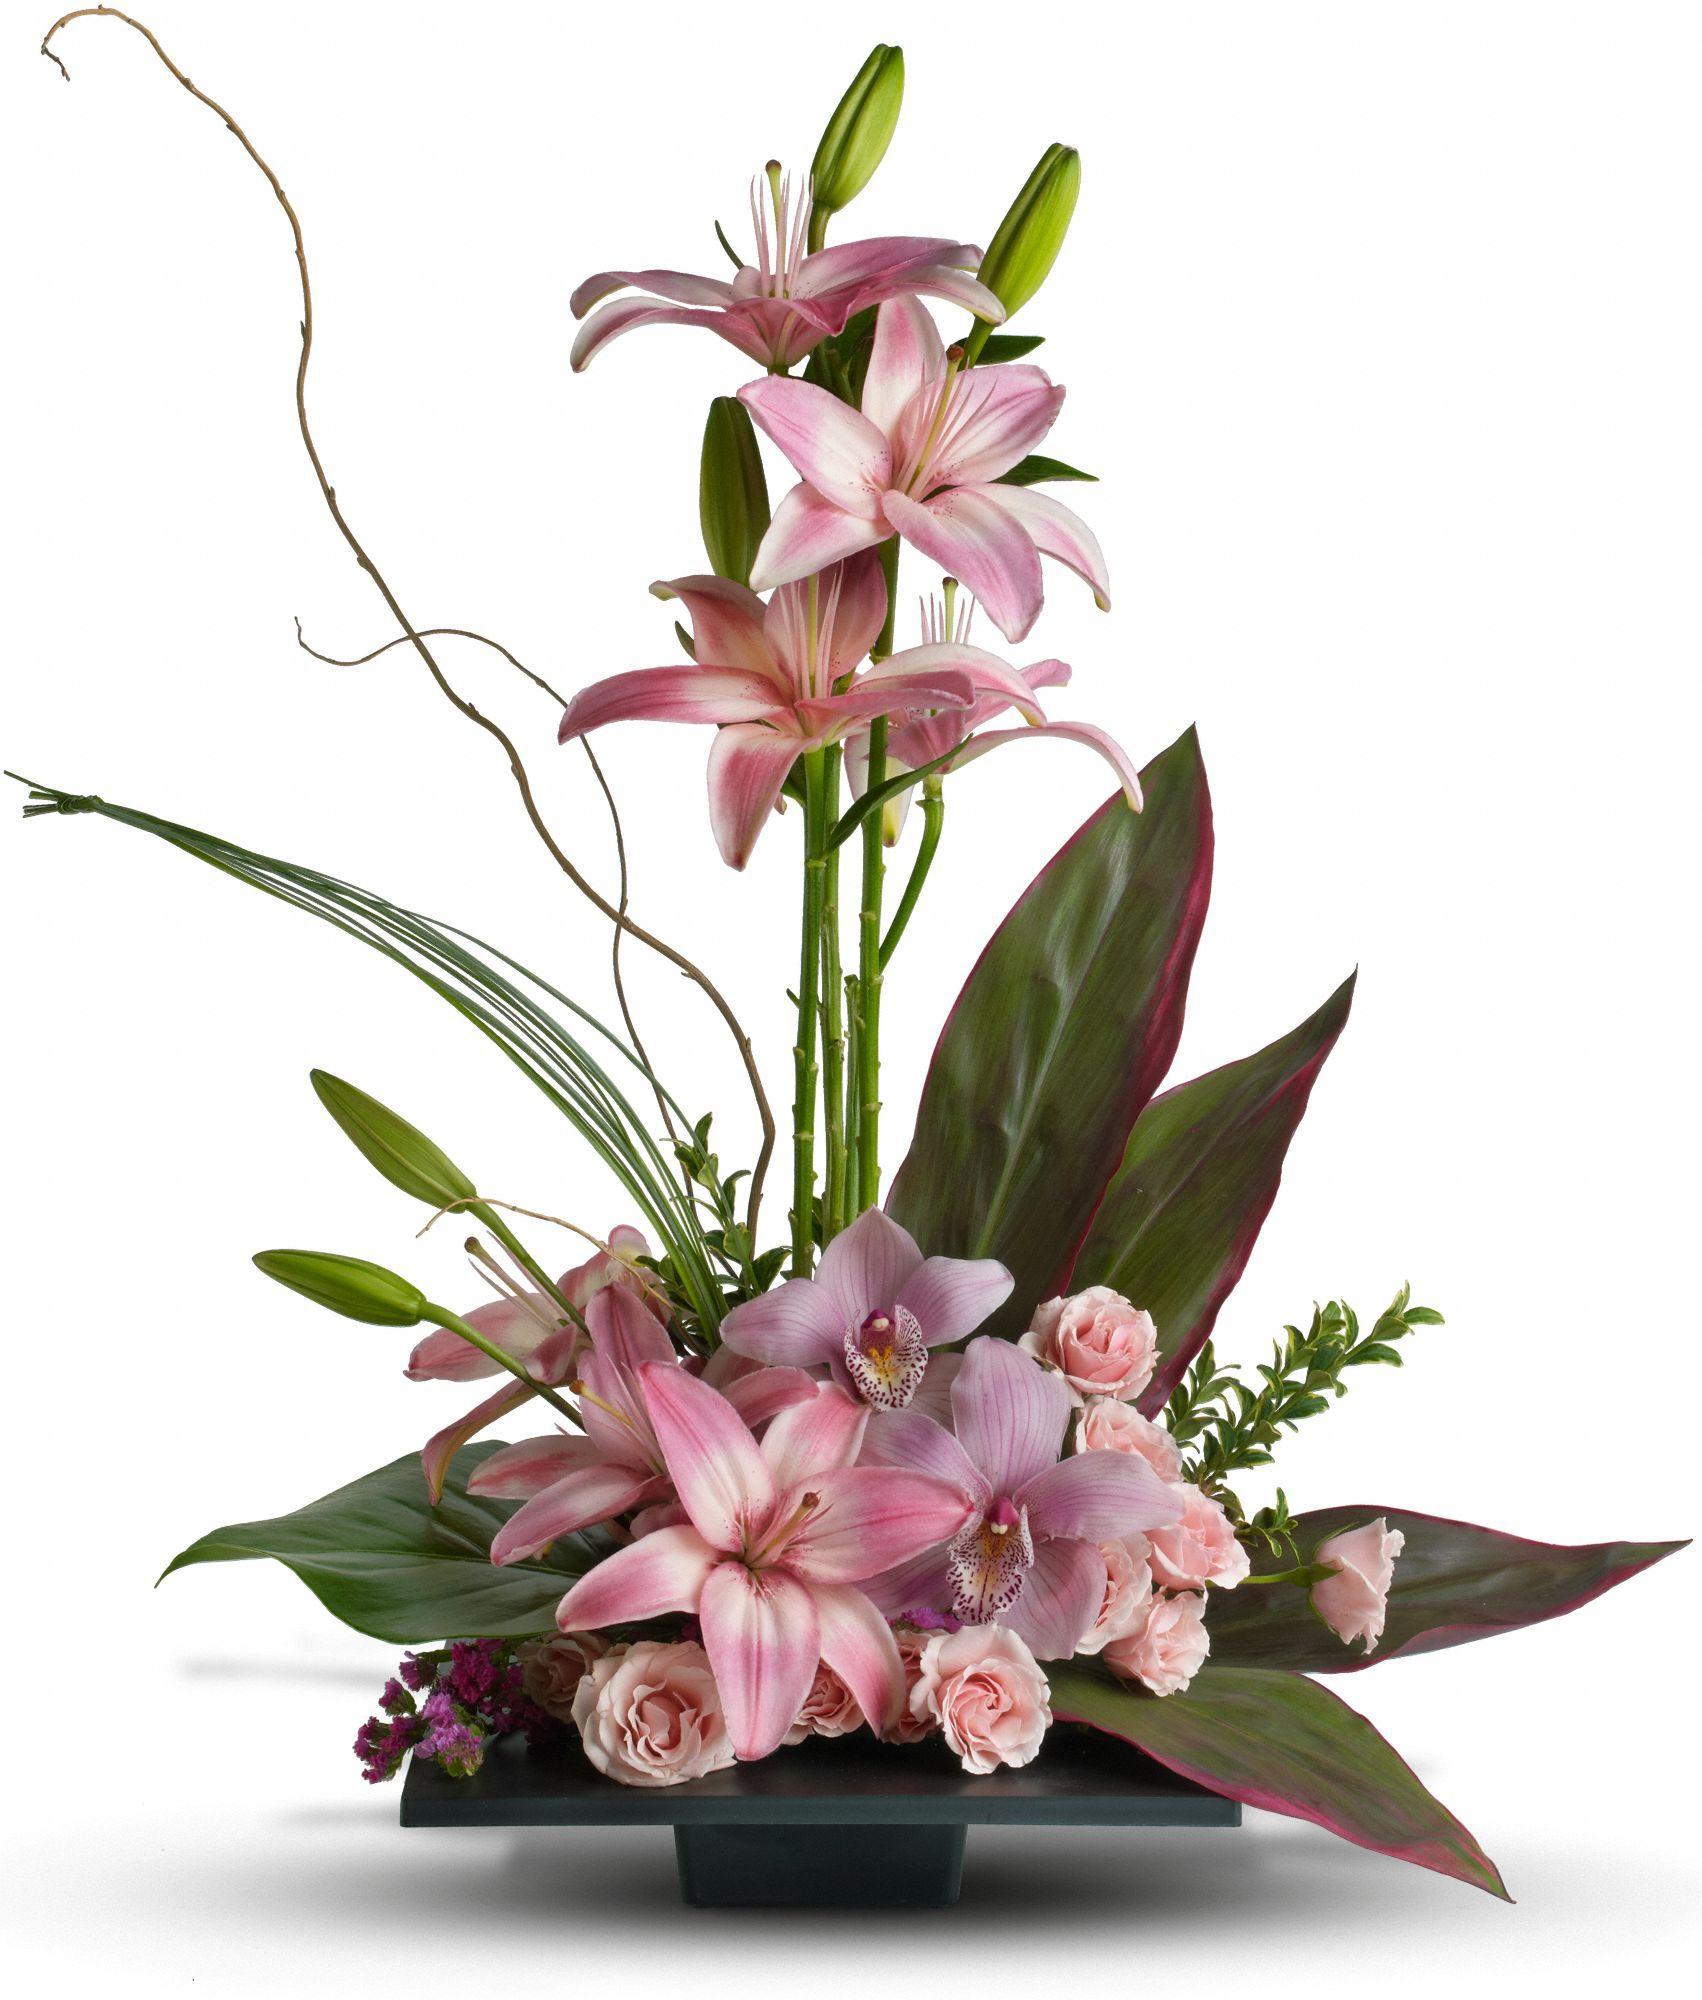 Imagination Blooms With Cymbidium Orchids Flowers Imagination Blooms With Cymbidium Orchid Flower Arrangements Church Flower Arrangements Flower Arrangements